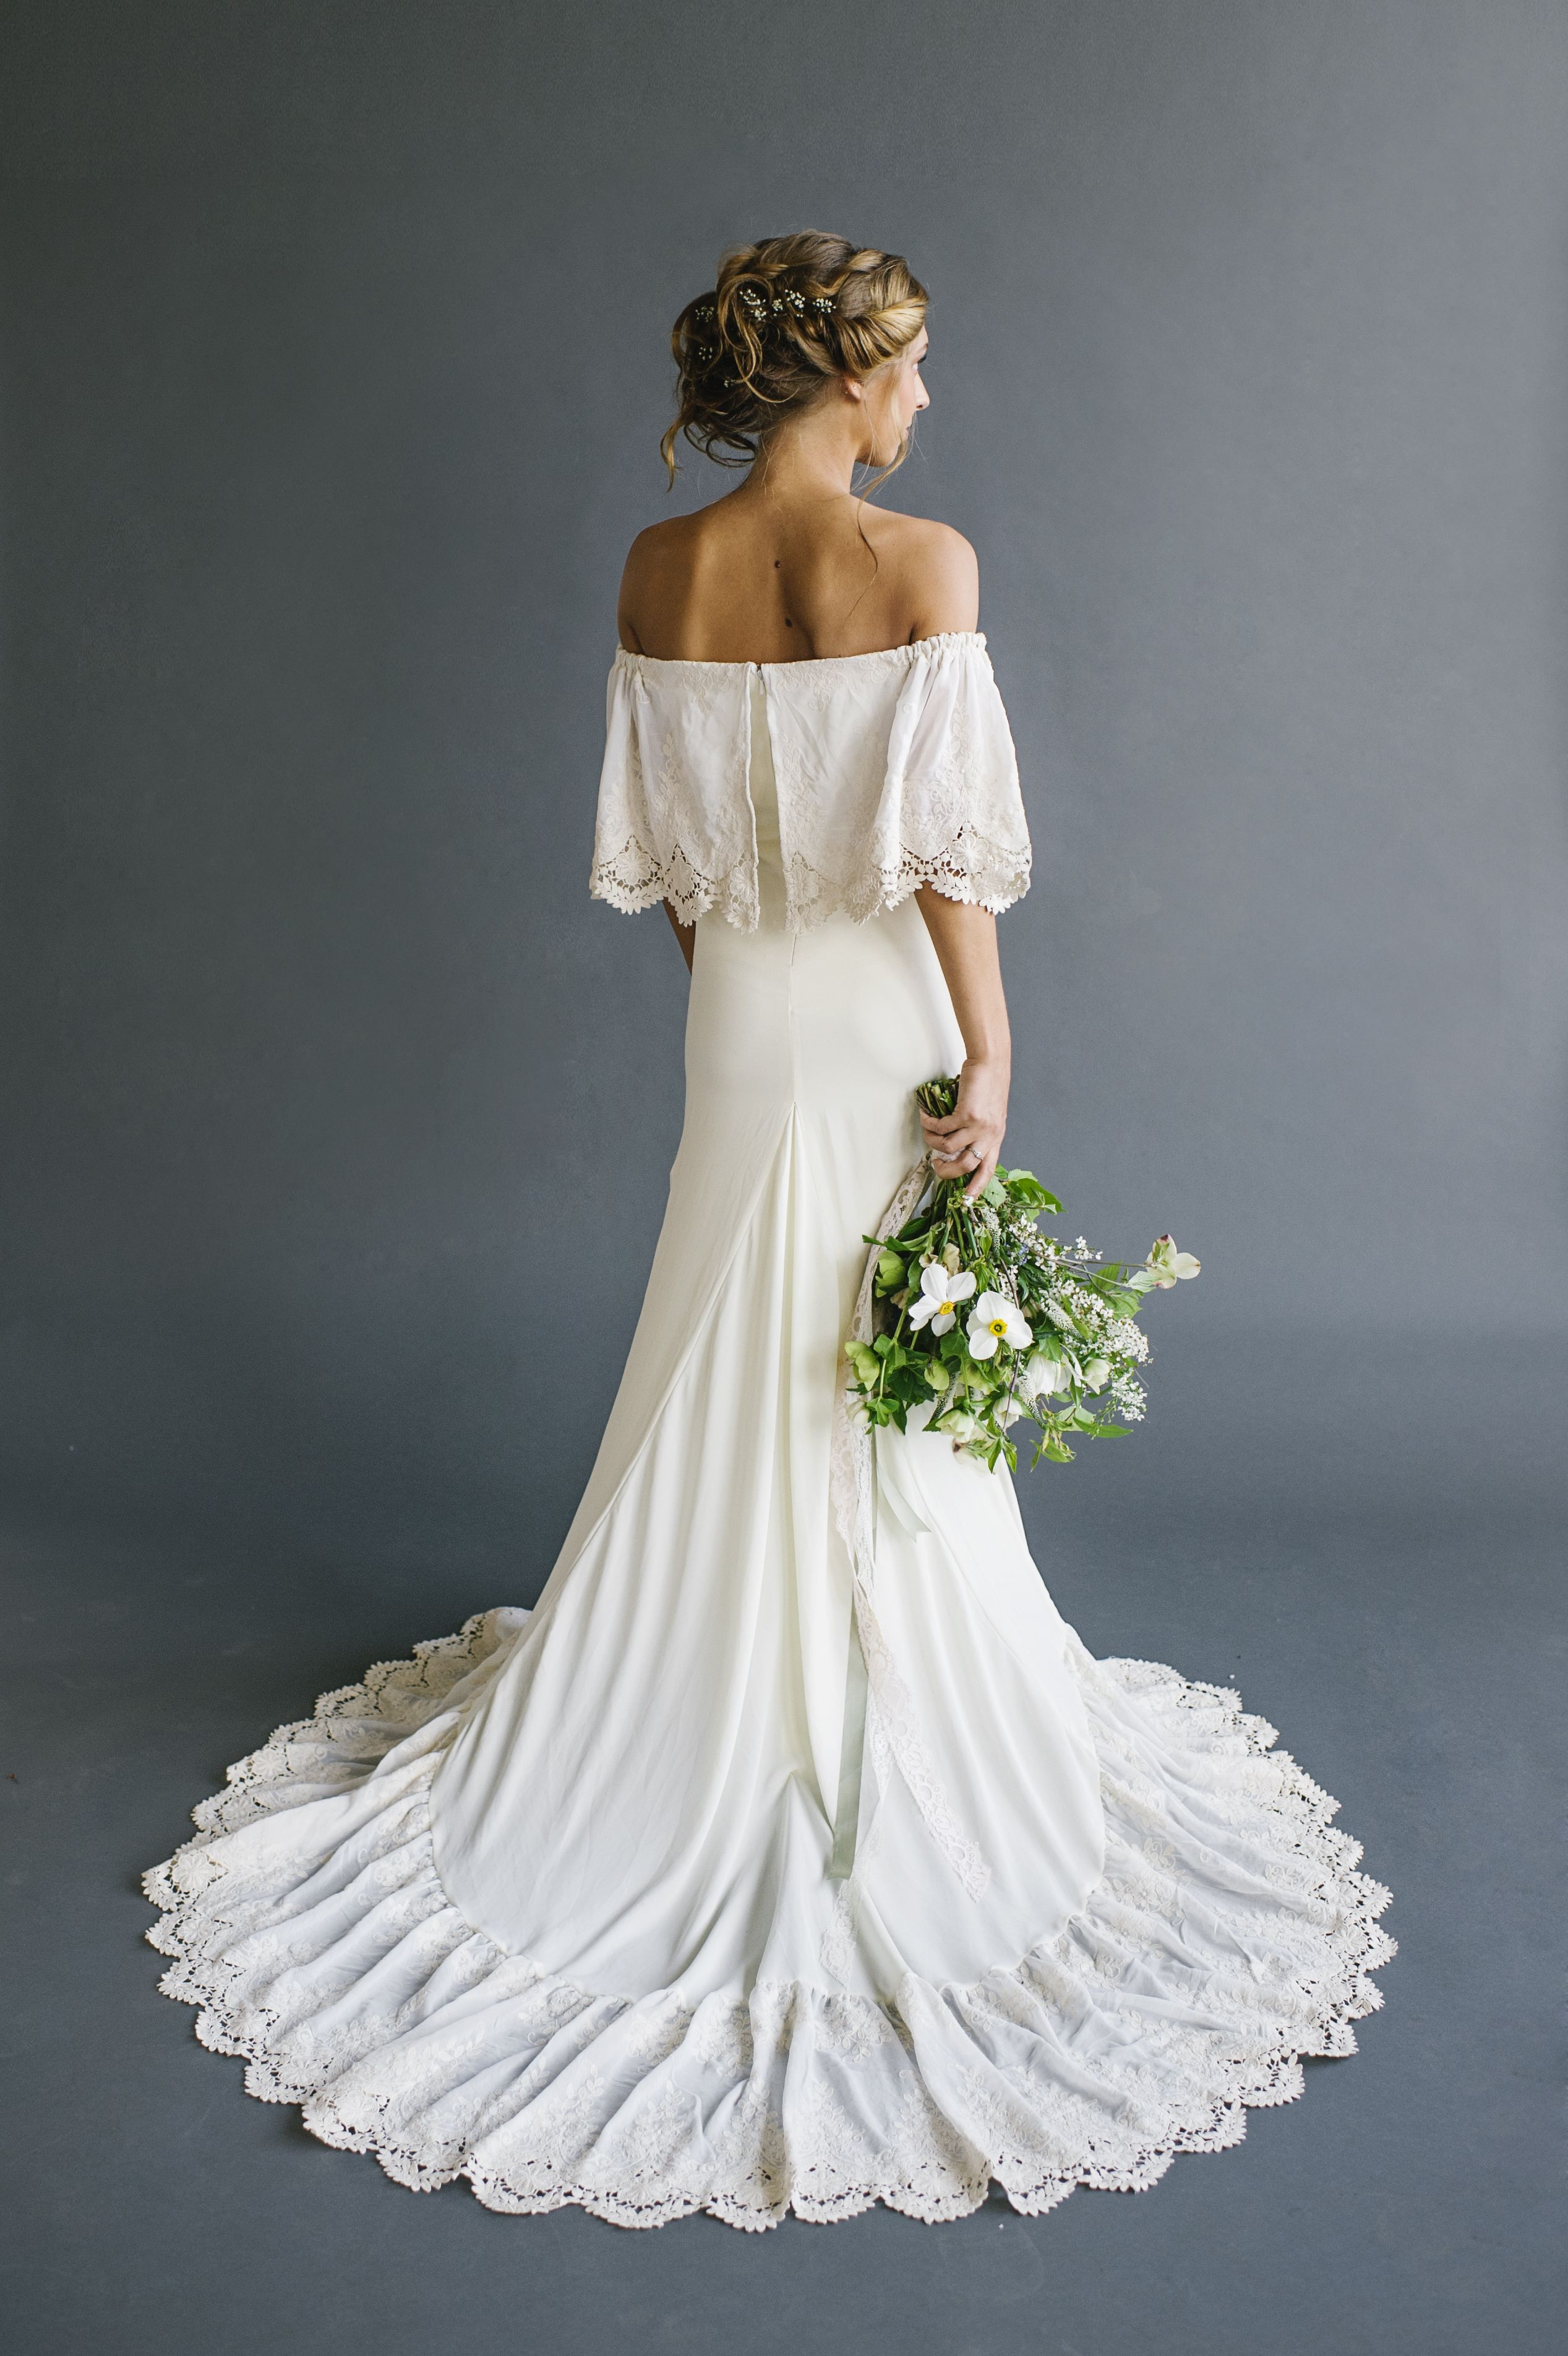 boho wedding dress White Bohemian Lihi Hod Wedding Dress Collection Persian Wedding and Bohemian